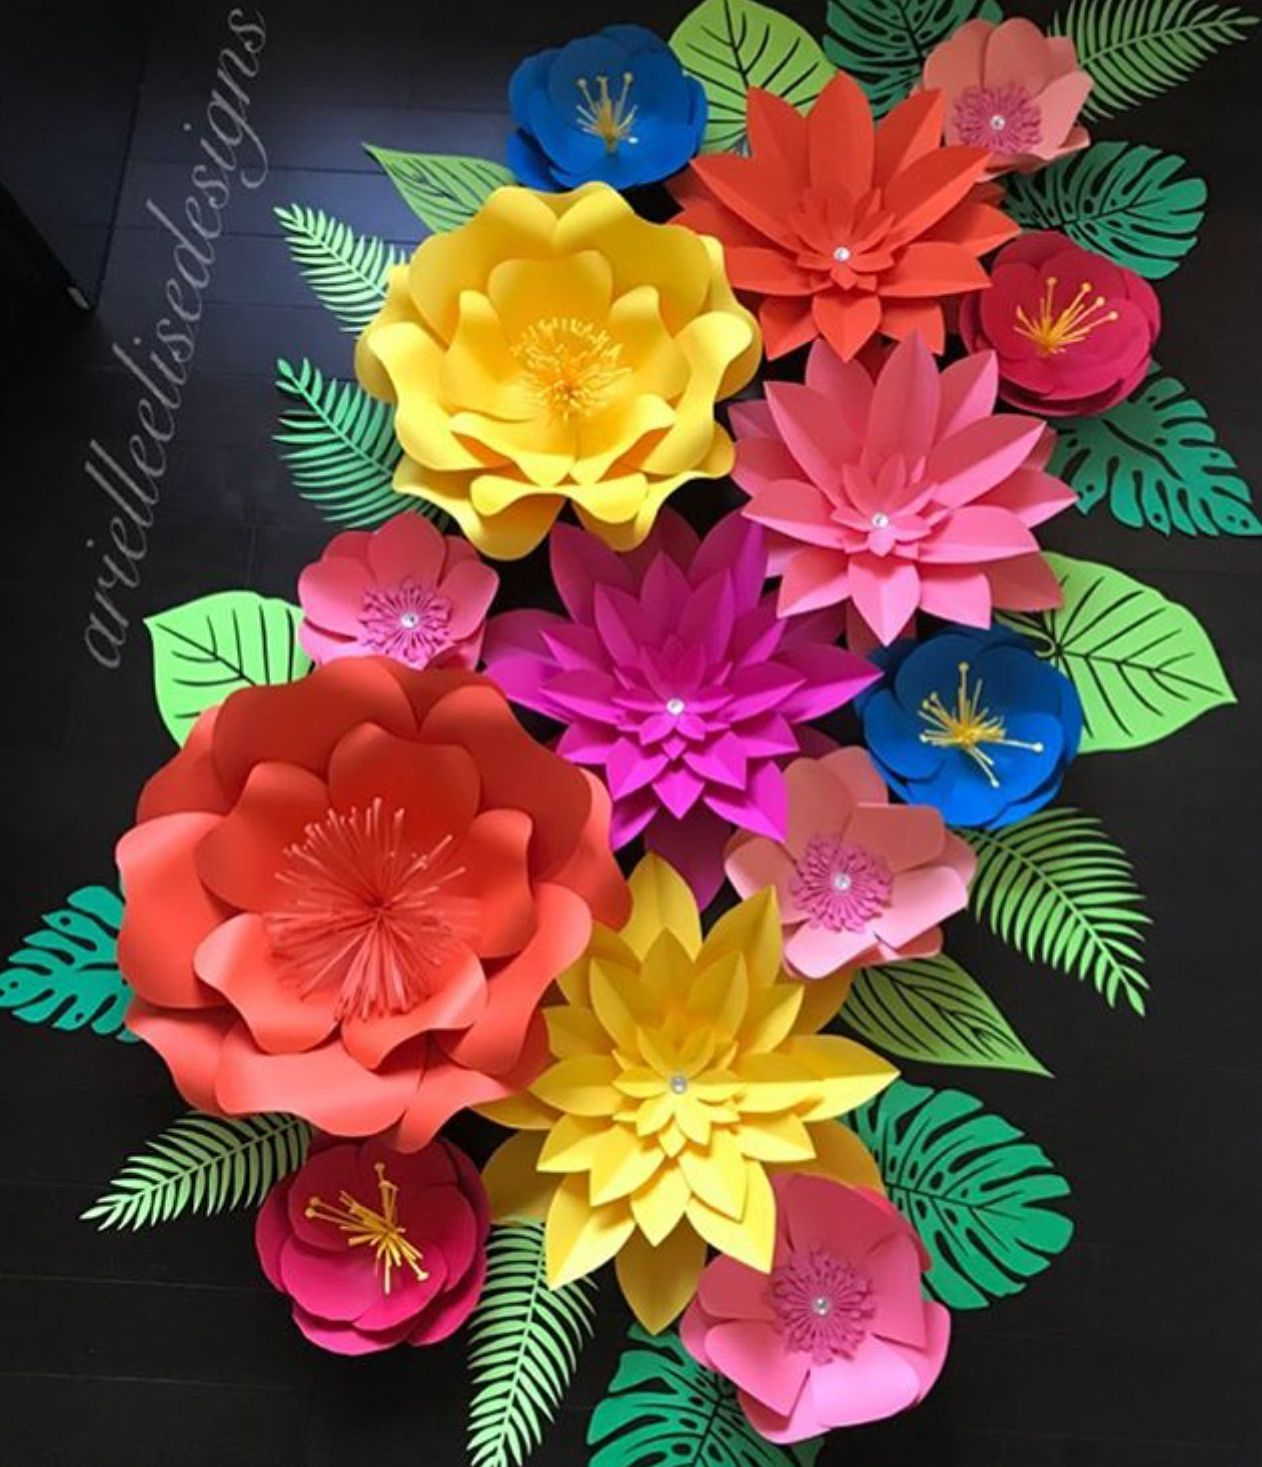 Pin by Kaz Ripper on Handmade Paper Flowers  Pinterest  Handmade